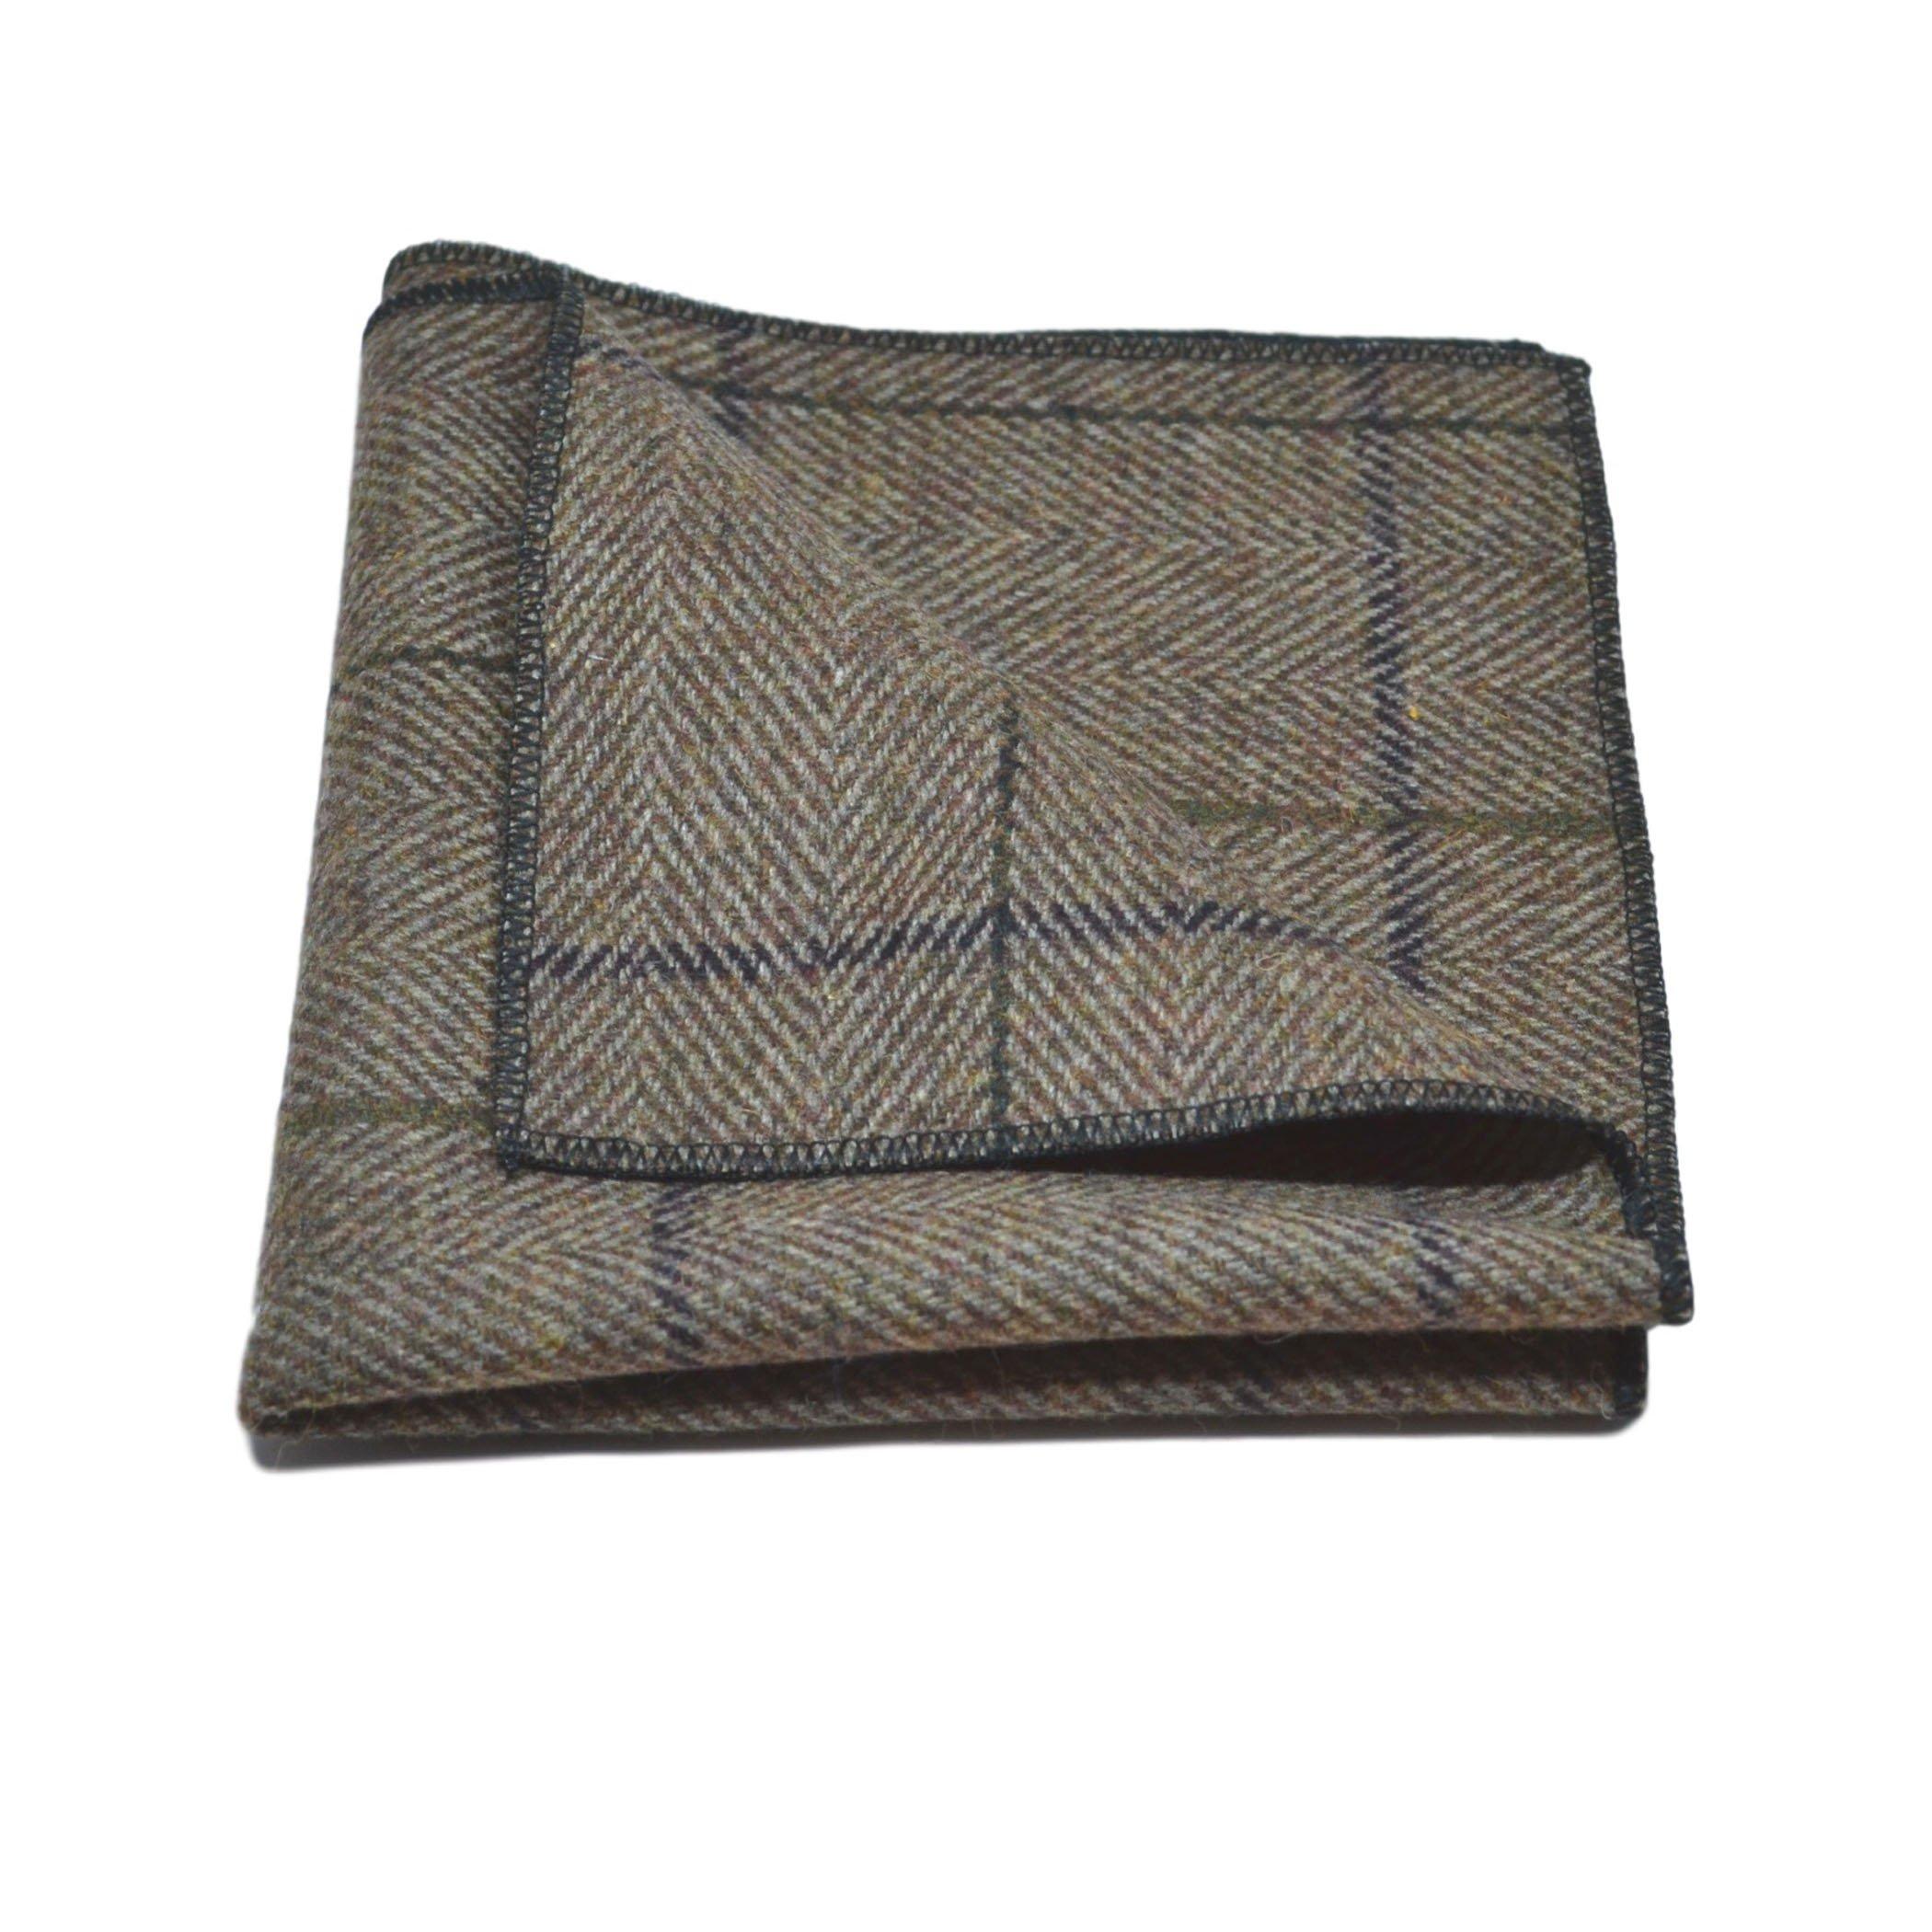 Luxury Peanut Brown Tweed Pocket Square, Handkerchief